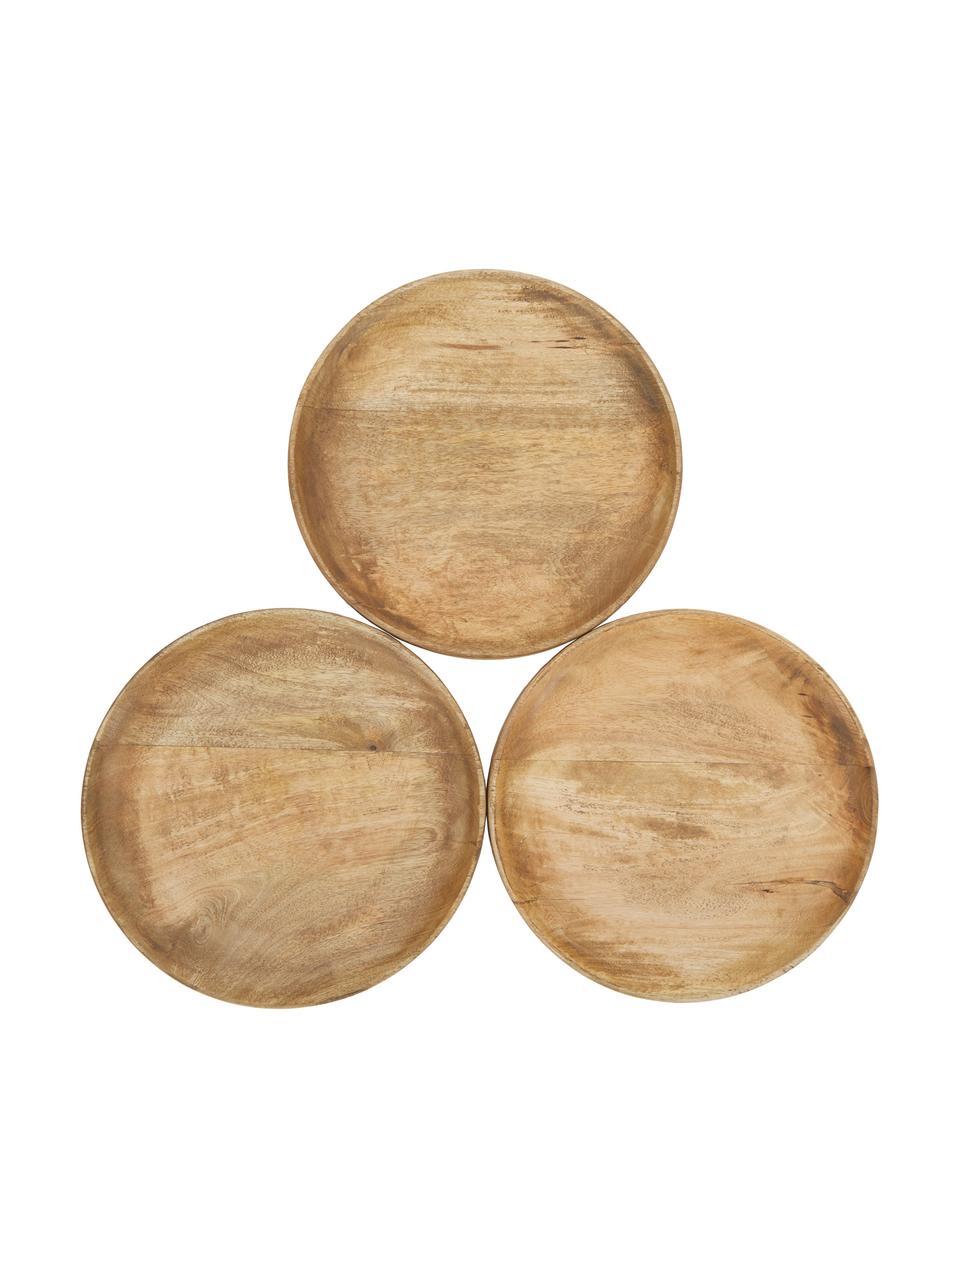 Rundes Deko-Tablett Forest aus Holz, Ø 30 cm, Mangoholz, Braun, Ø 30 cm